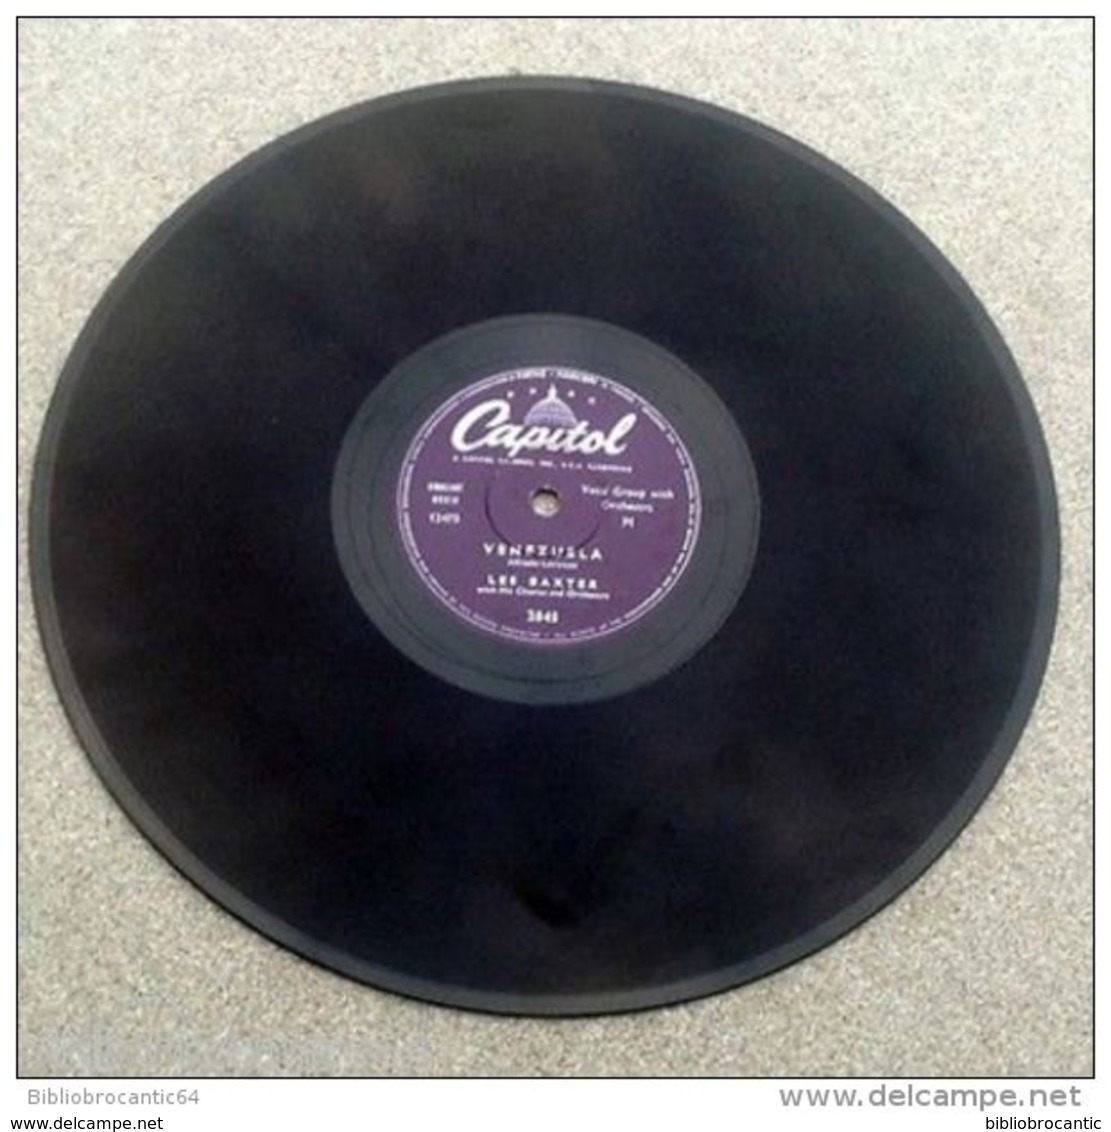 "78 Tours"" LES BAXTER  "" < THE HIGH AND THE MIGHT / VENEZUELA  < CAPITOL 2845 - 78 Rpm - Schellackplatten"